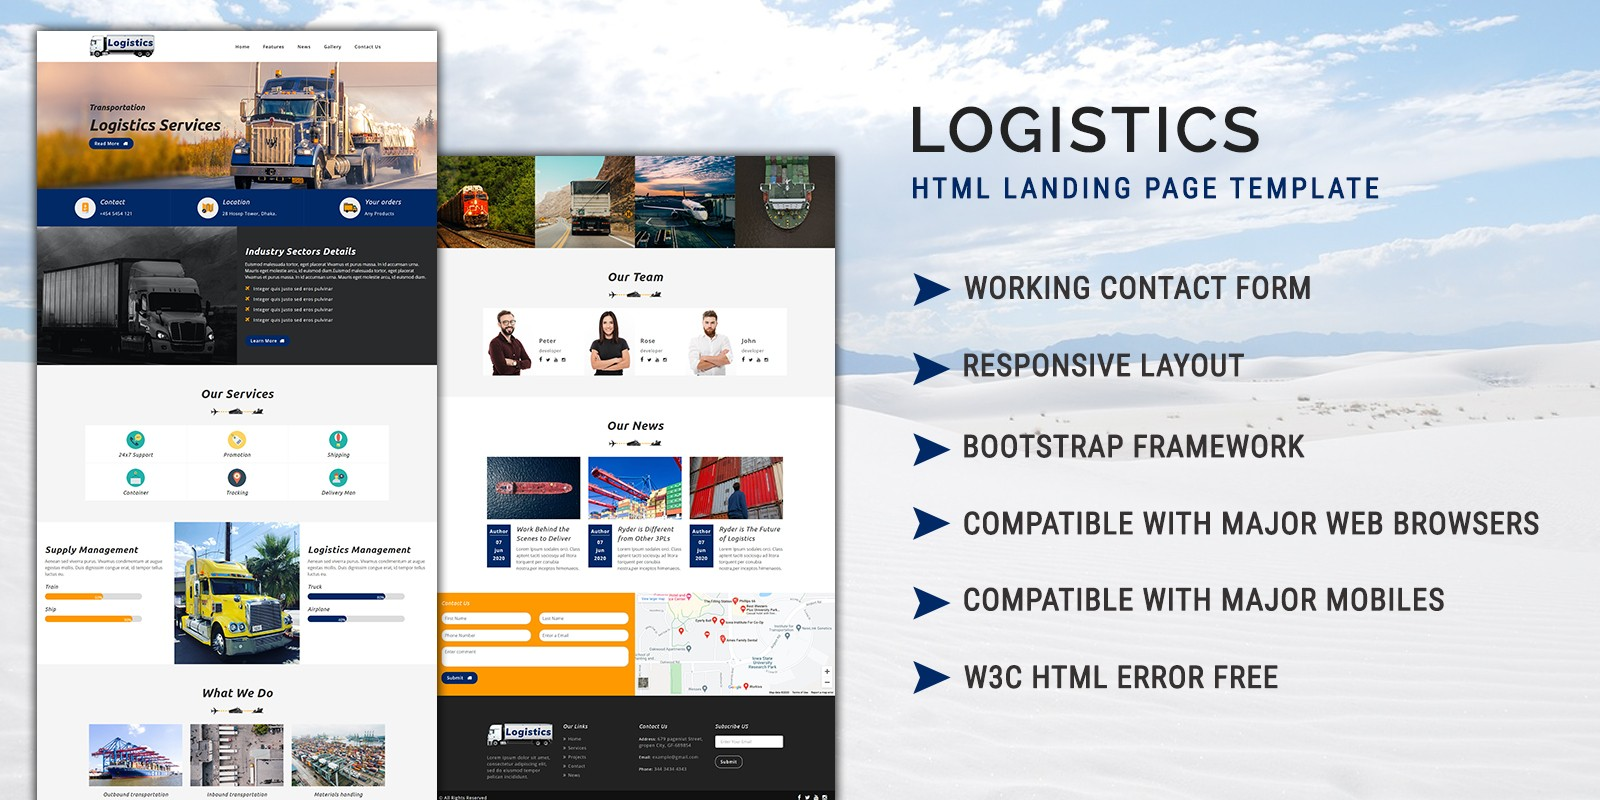 Logistics HTML Landing Page Template